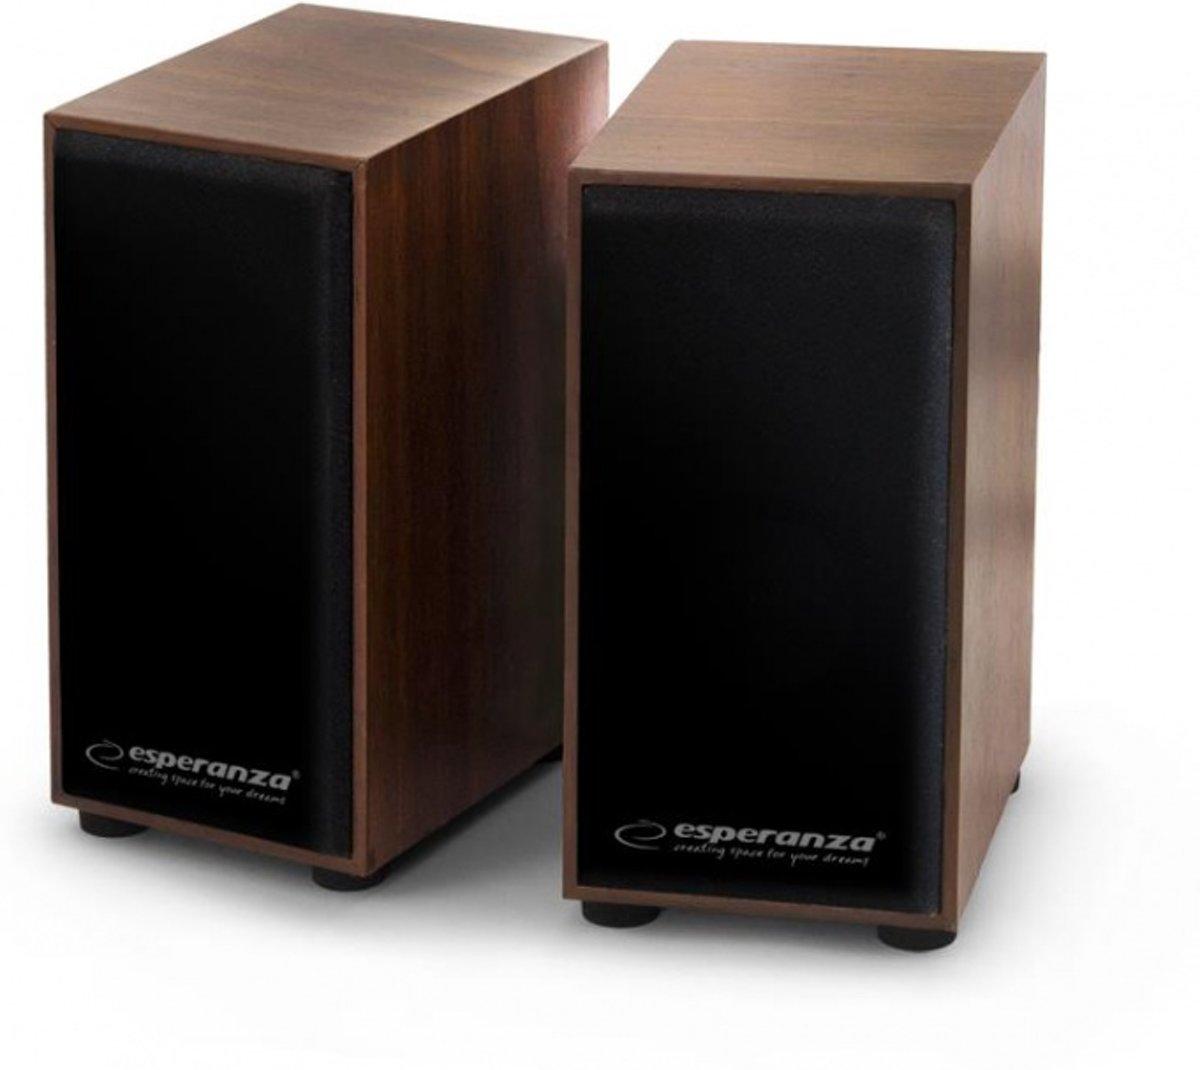 Esperanza Stereo Speakers 2.0 Folk - met houten behuizing kopen